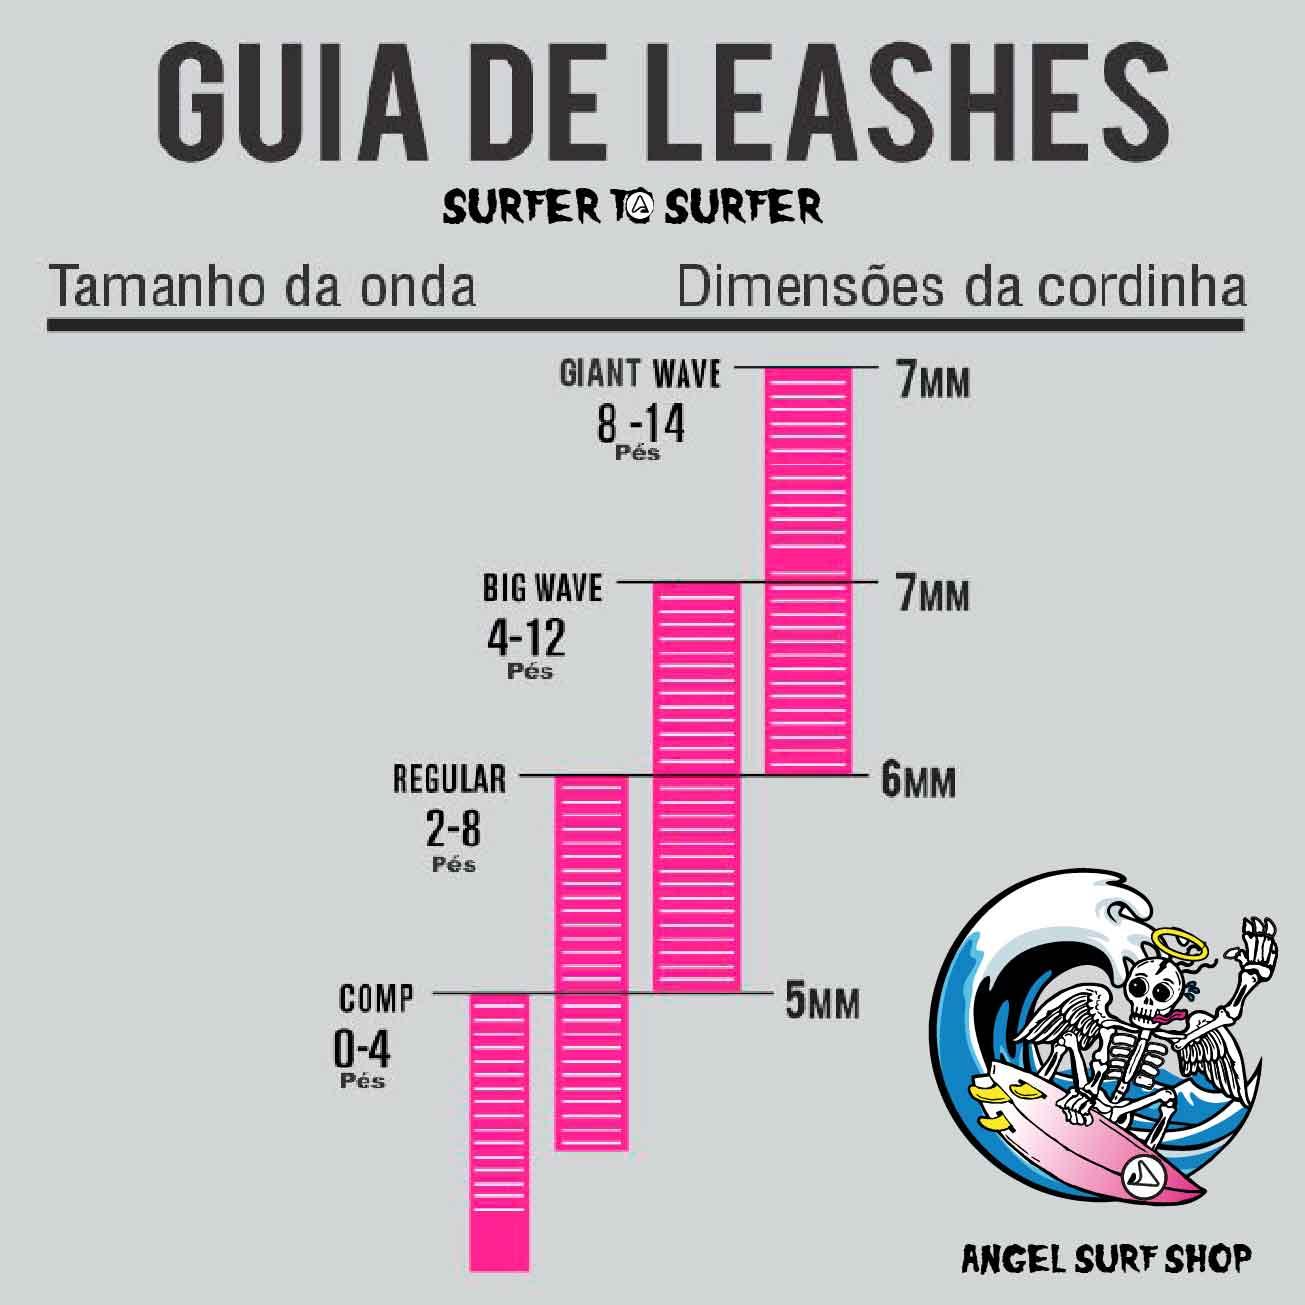 Leash Bully's COMPETIÇÃO Premium Series 6x6mm